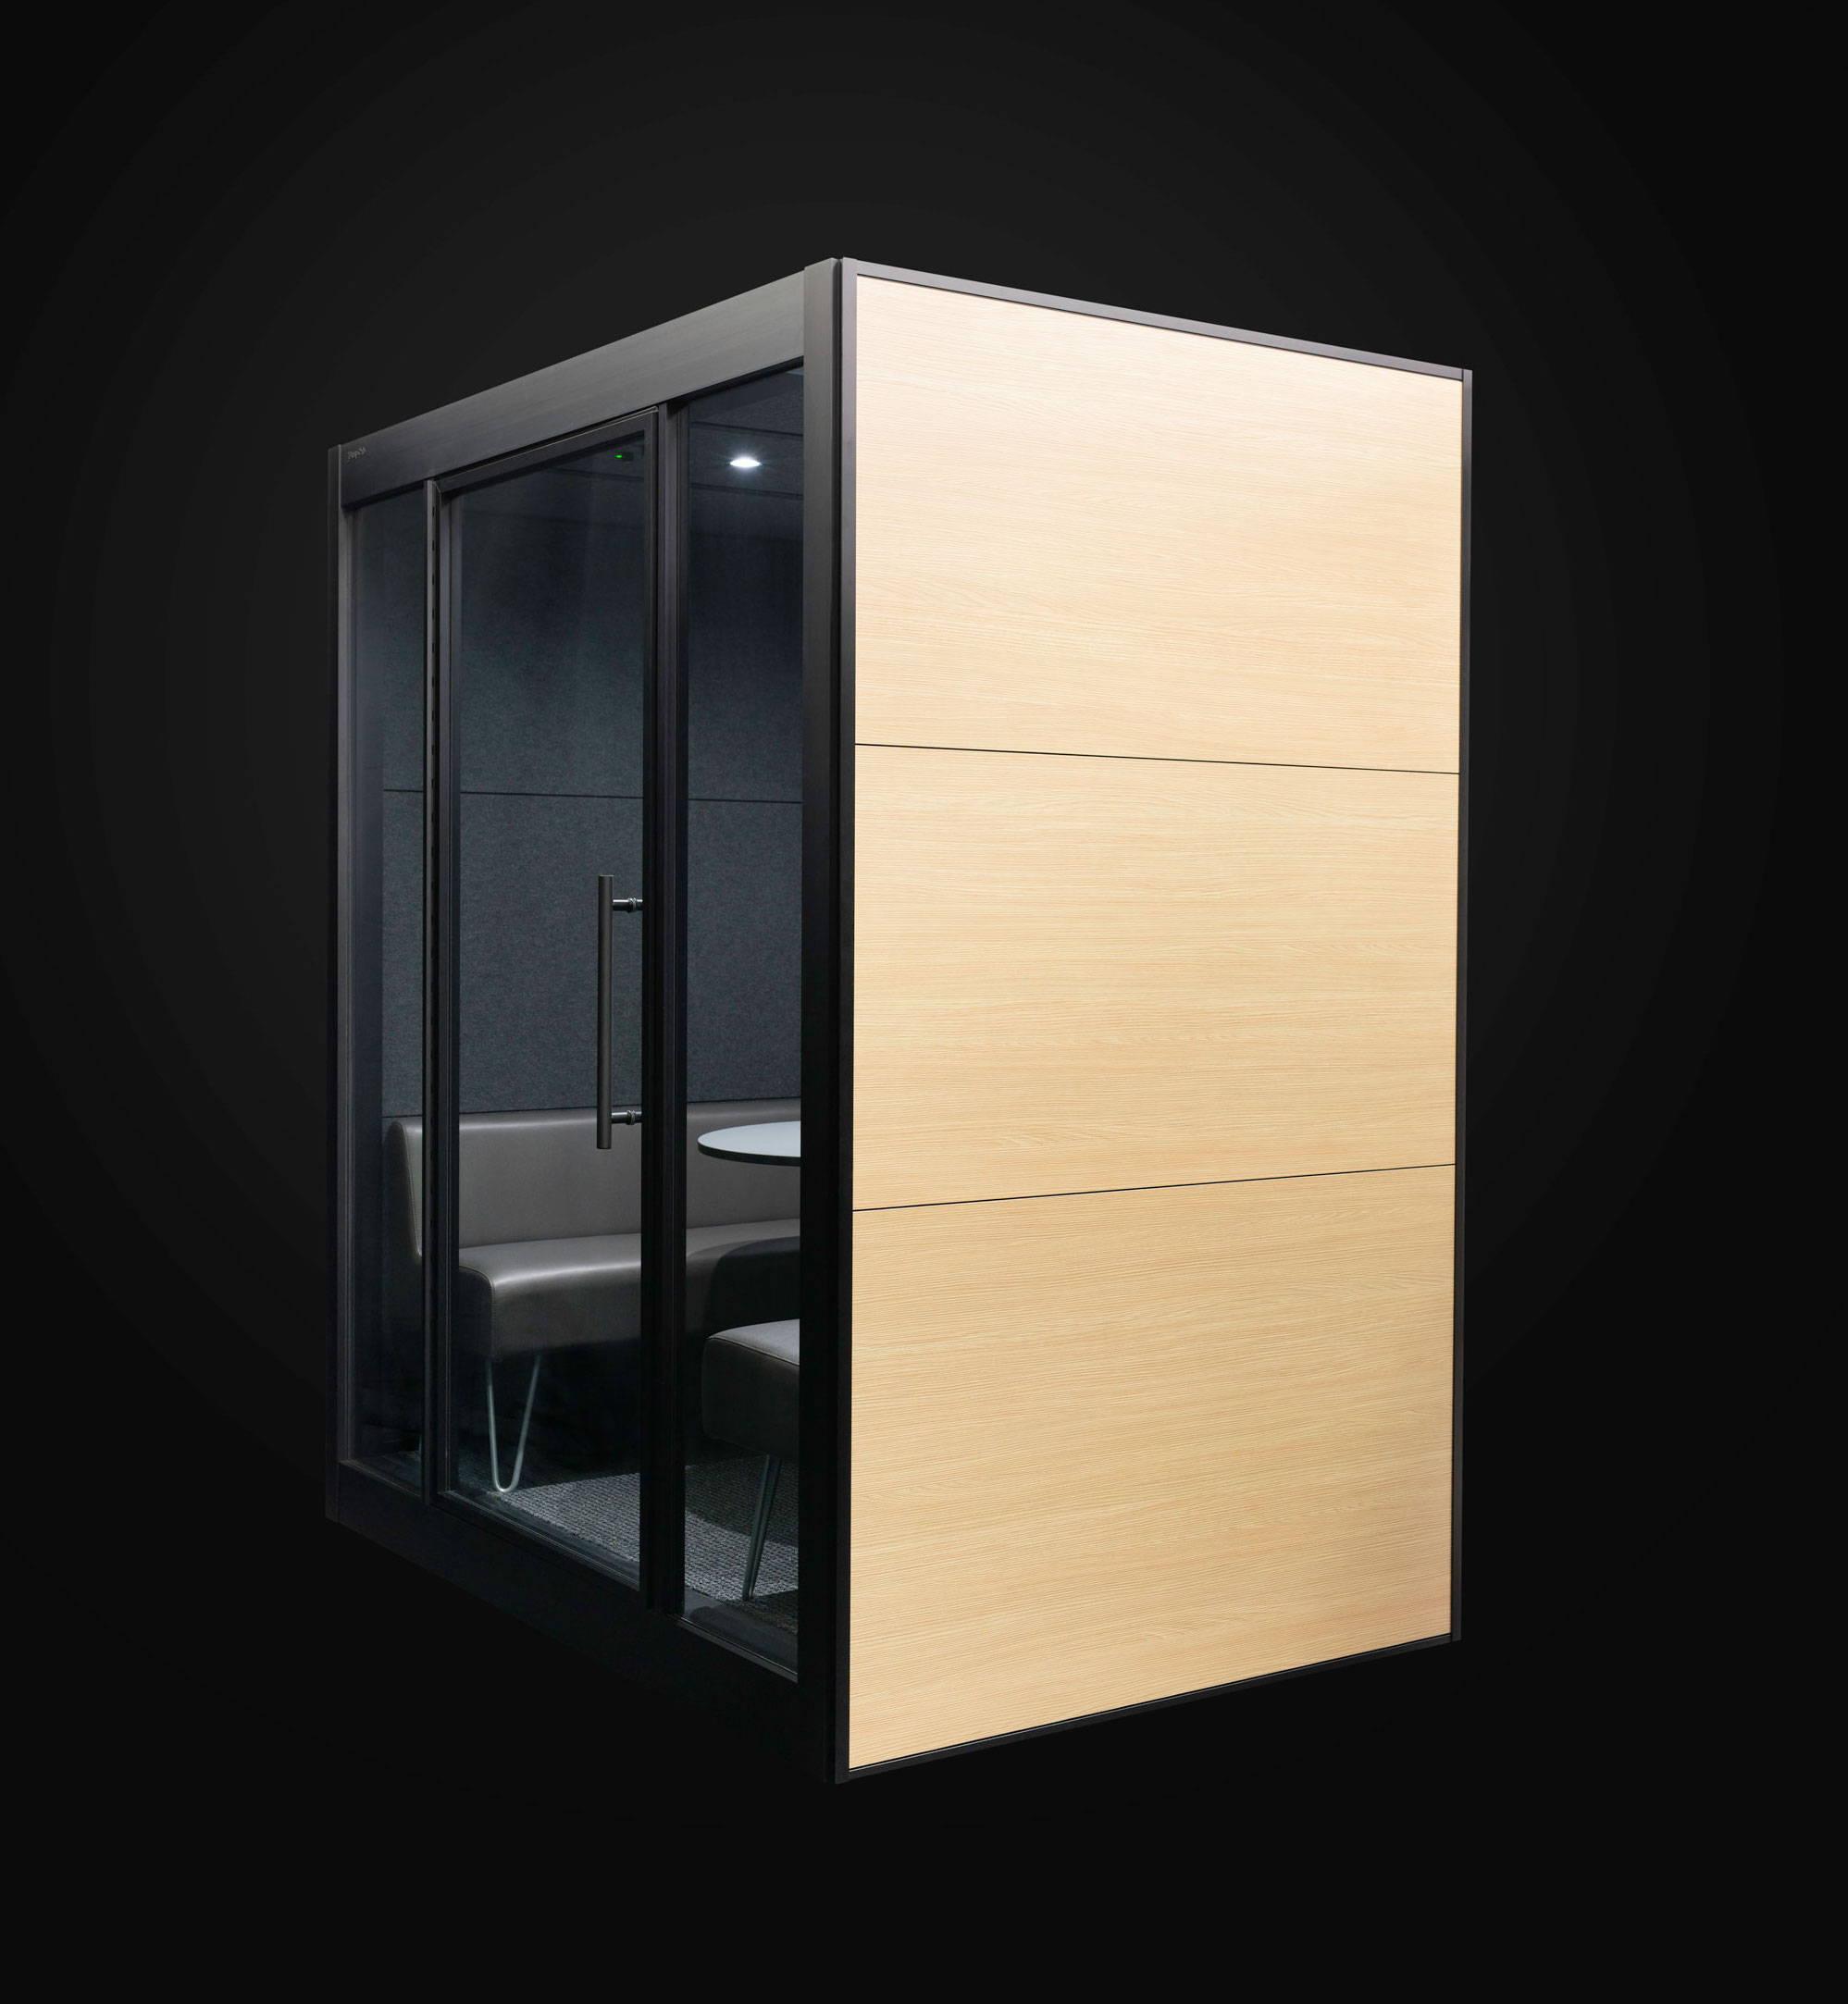 SnapCab Meet 4 meeting pod with wood laminate exterior panels